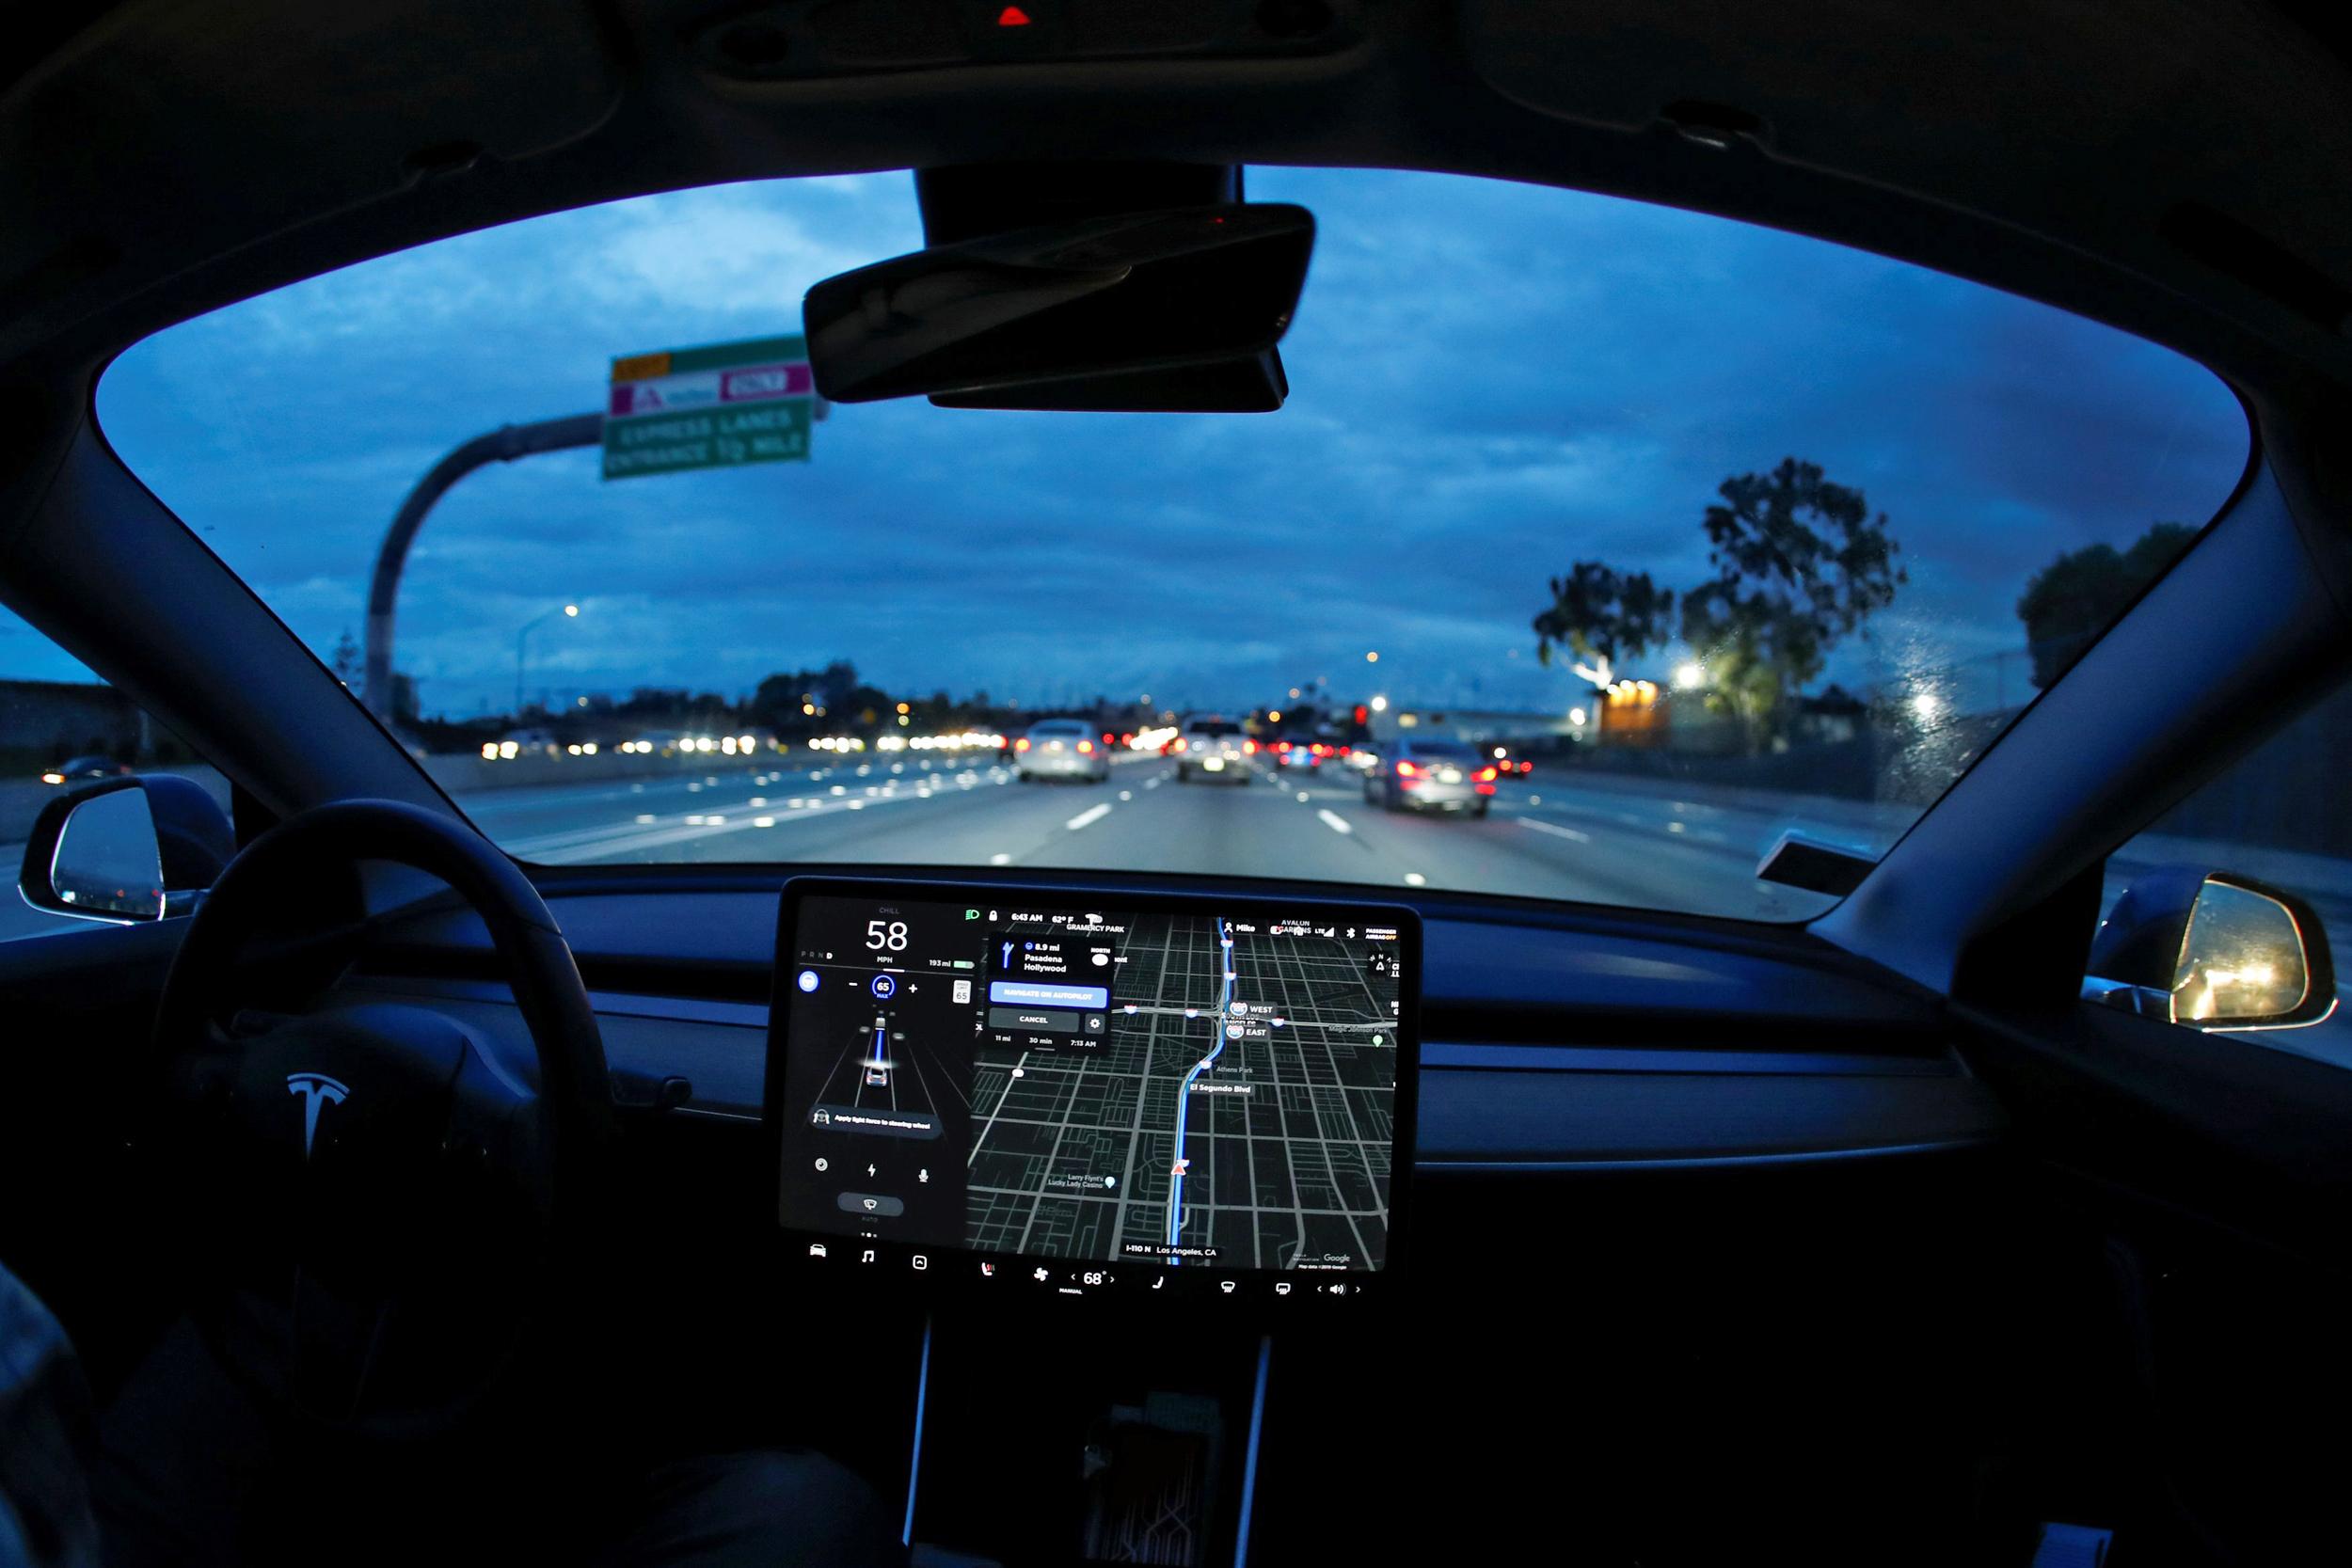 U.S. agency opens formal probe into Tesla Autopilot system